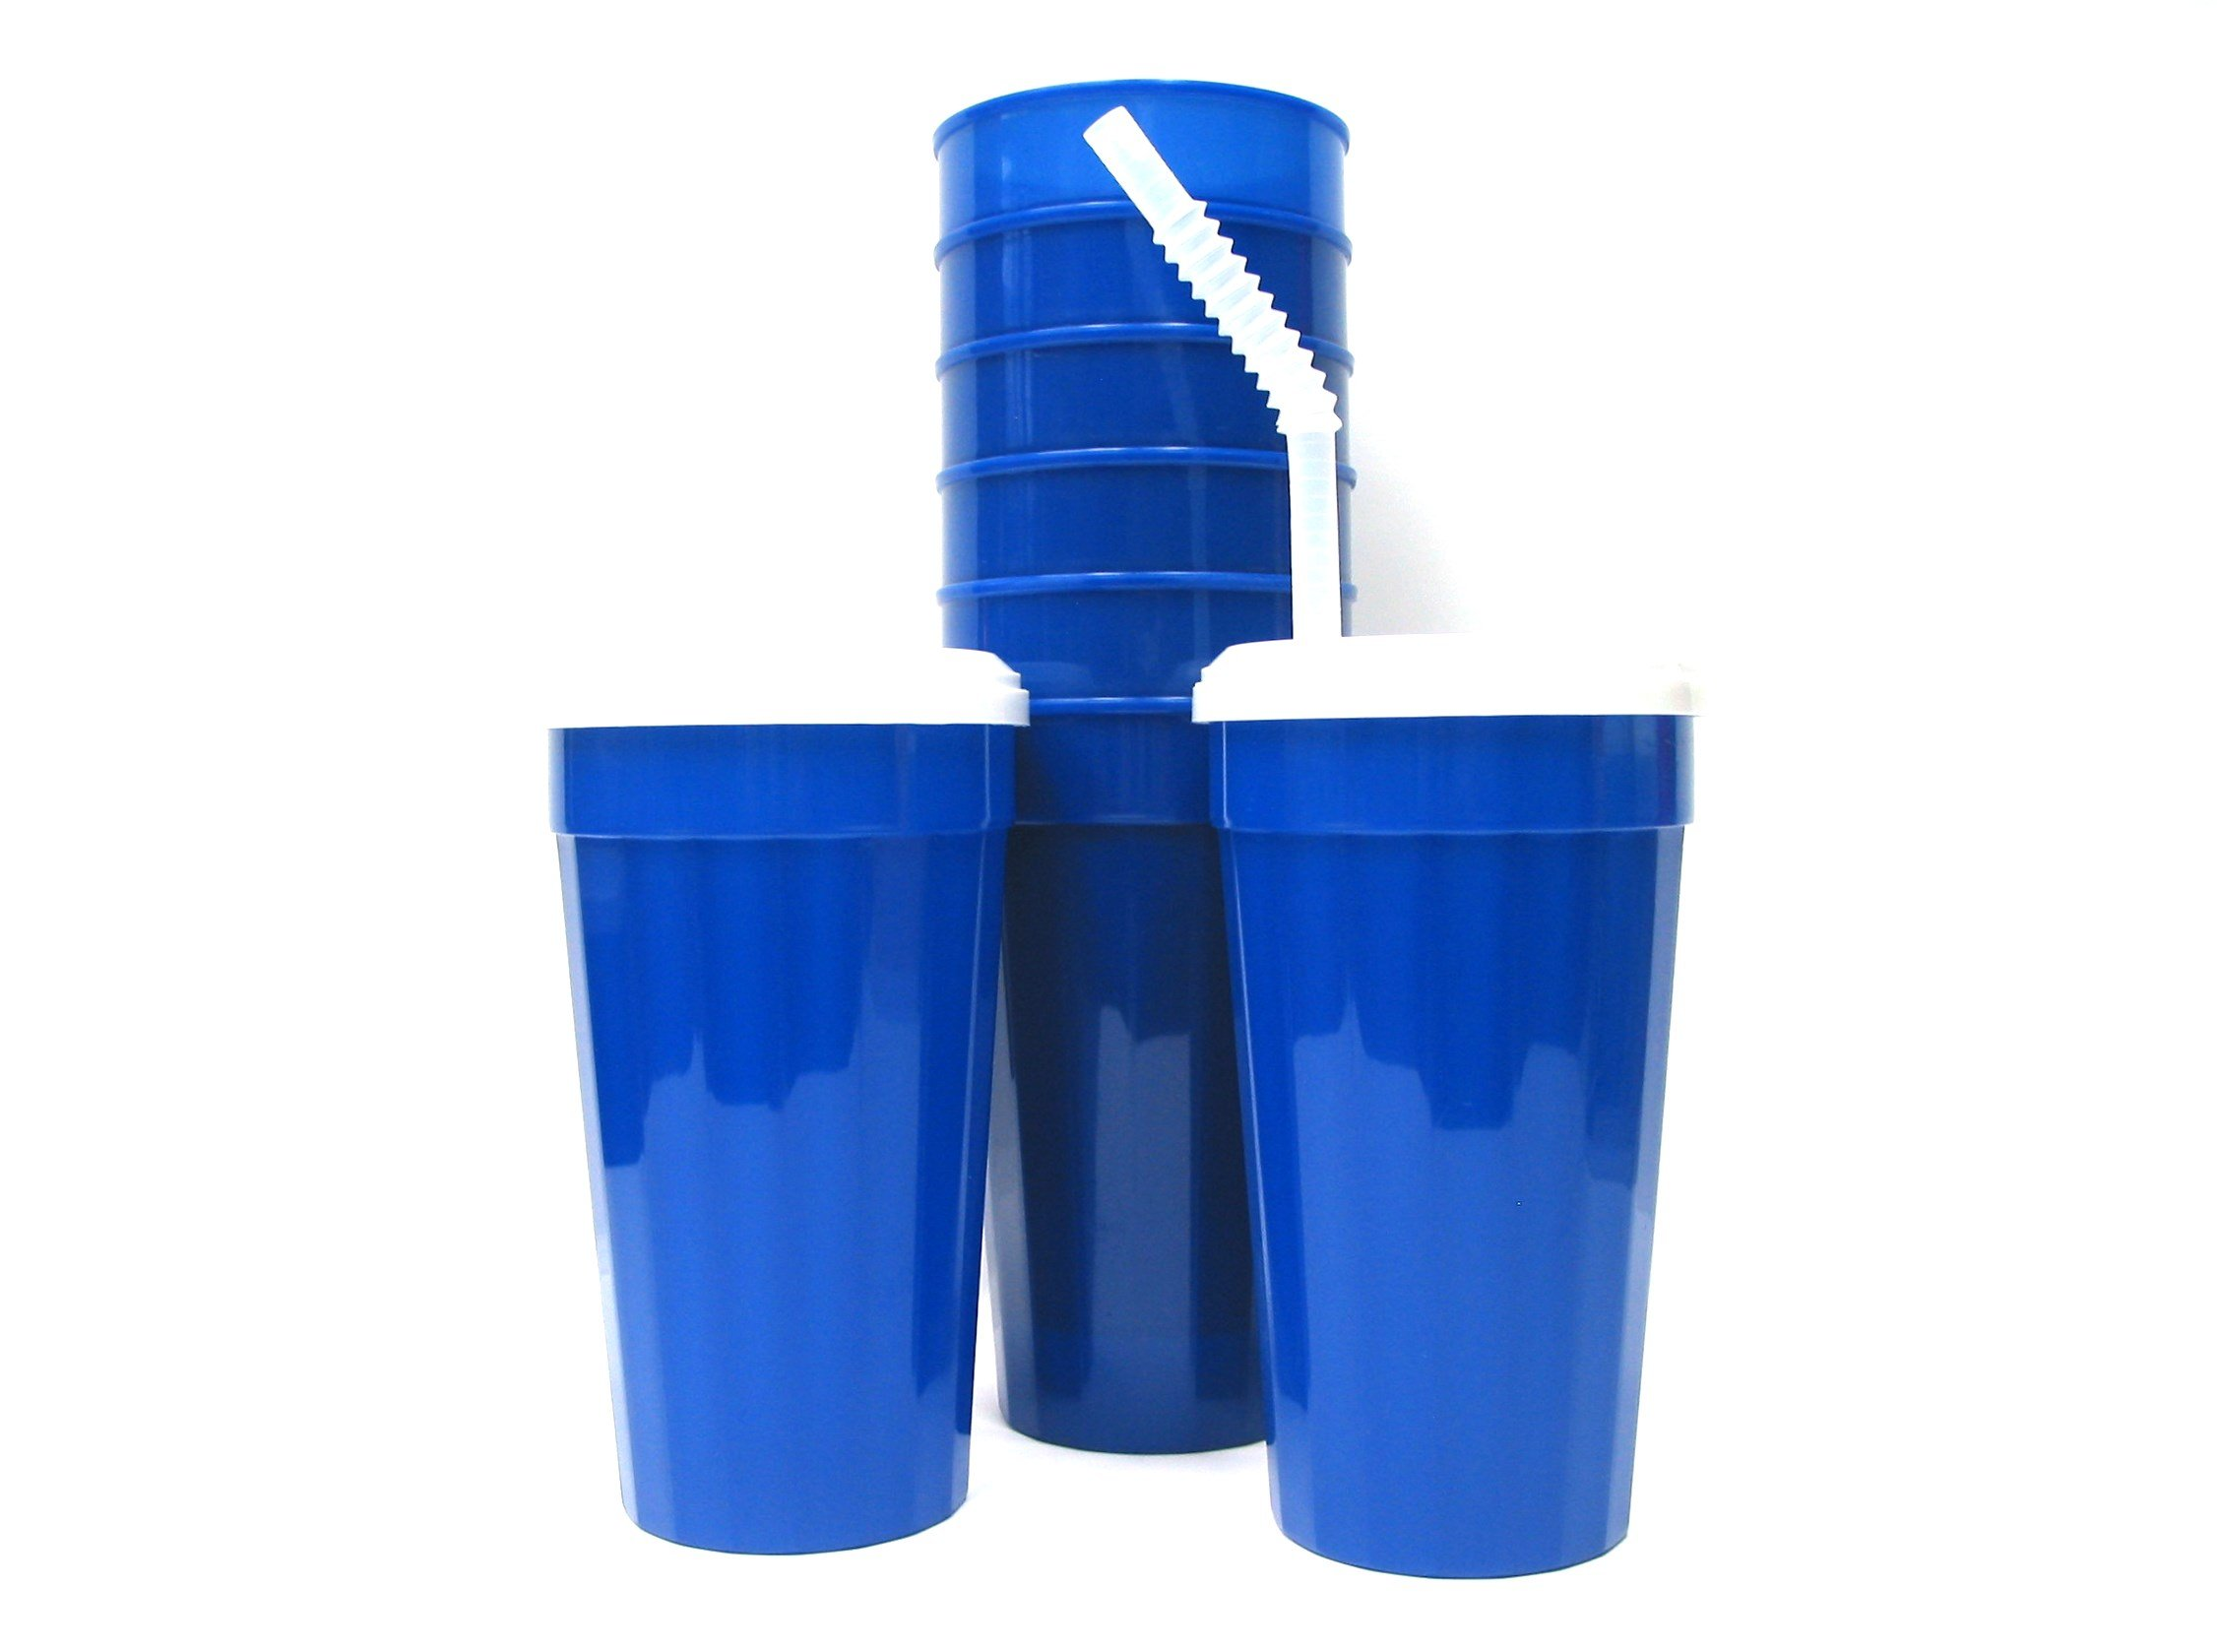 Talisman, Plastic Fluted Tumblers, Lids & Straws 32 Ounces, 8 Pack, Blue